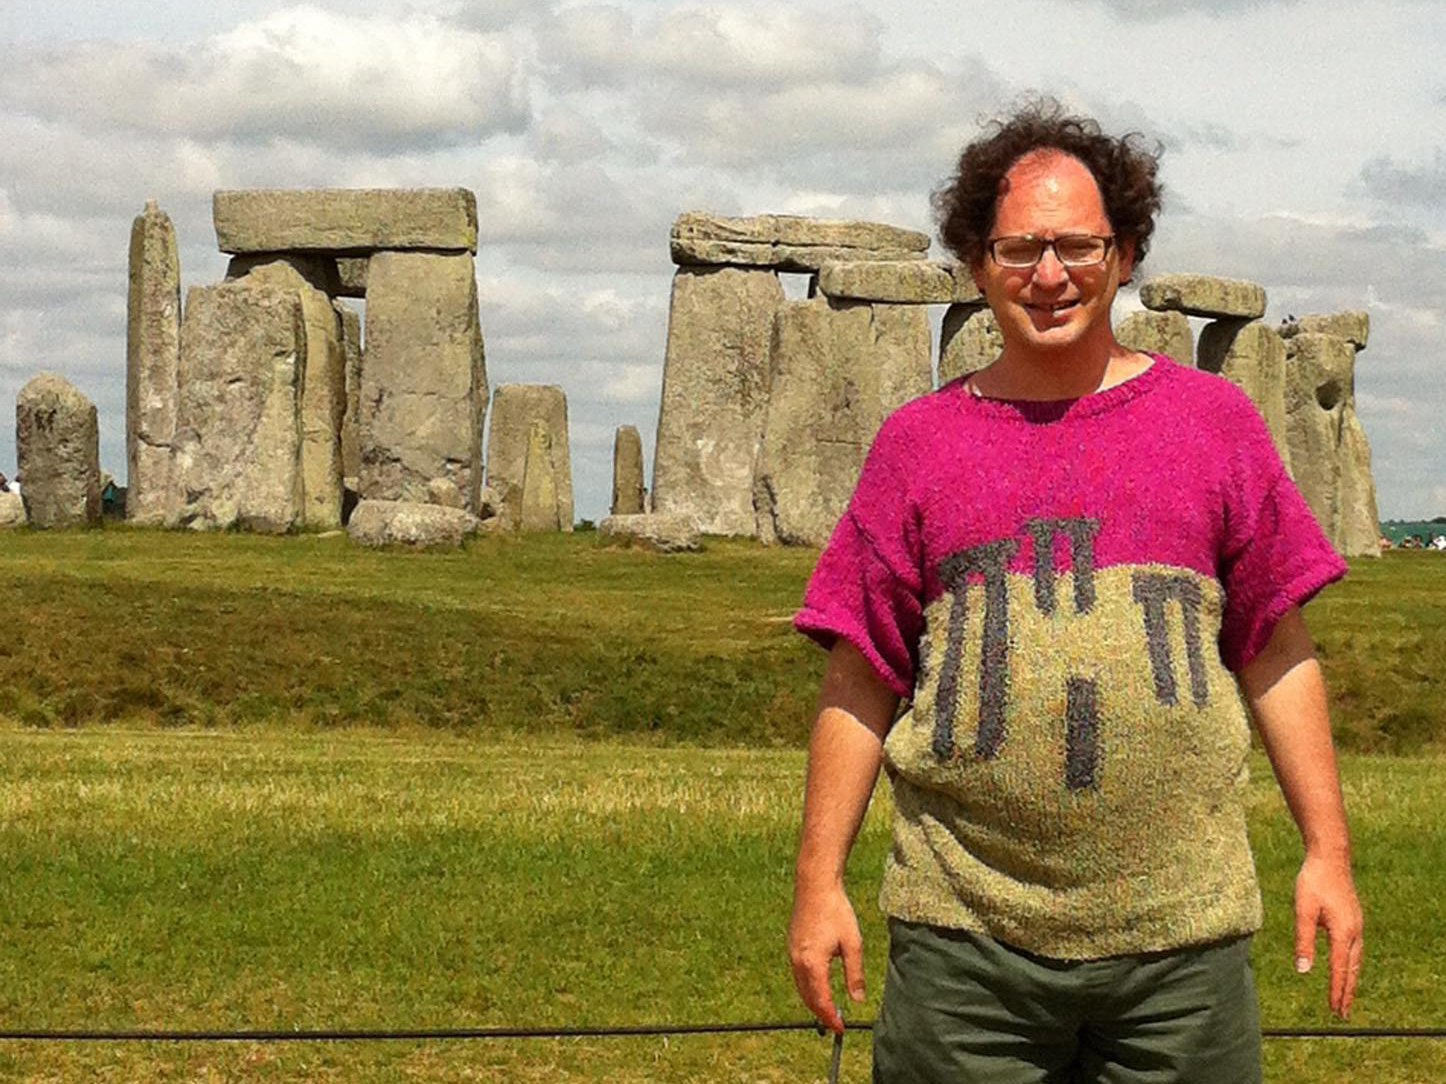 For Stonehenge.